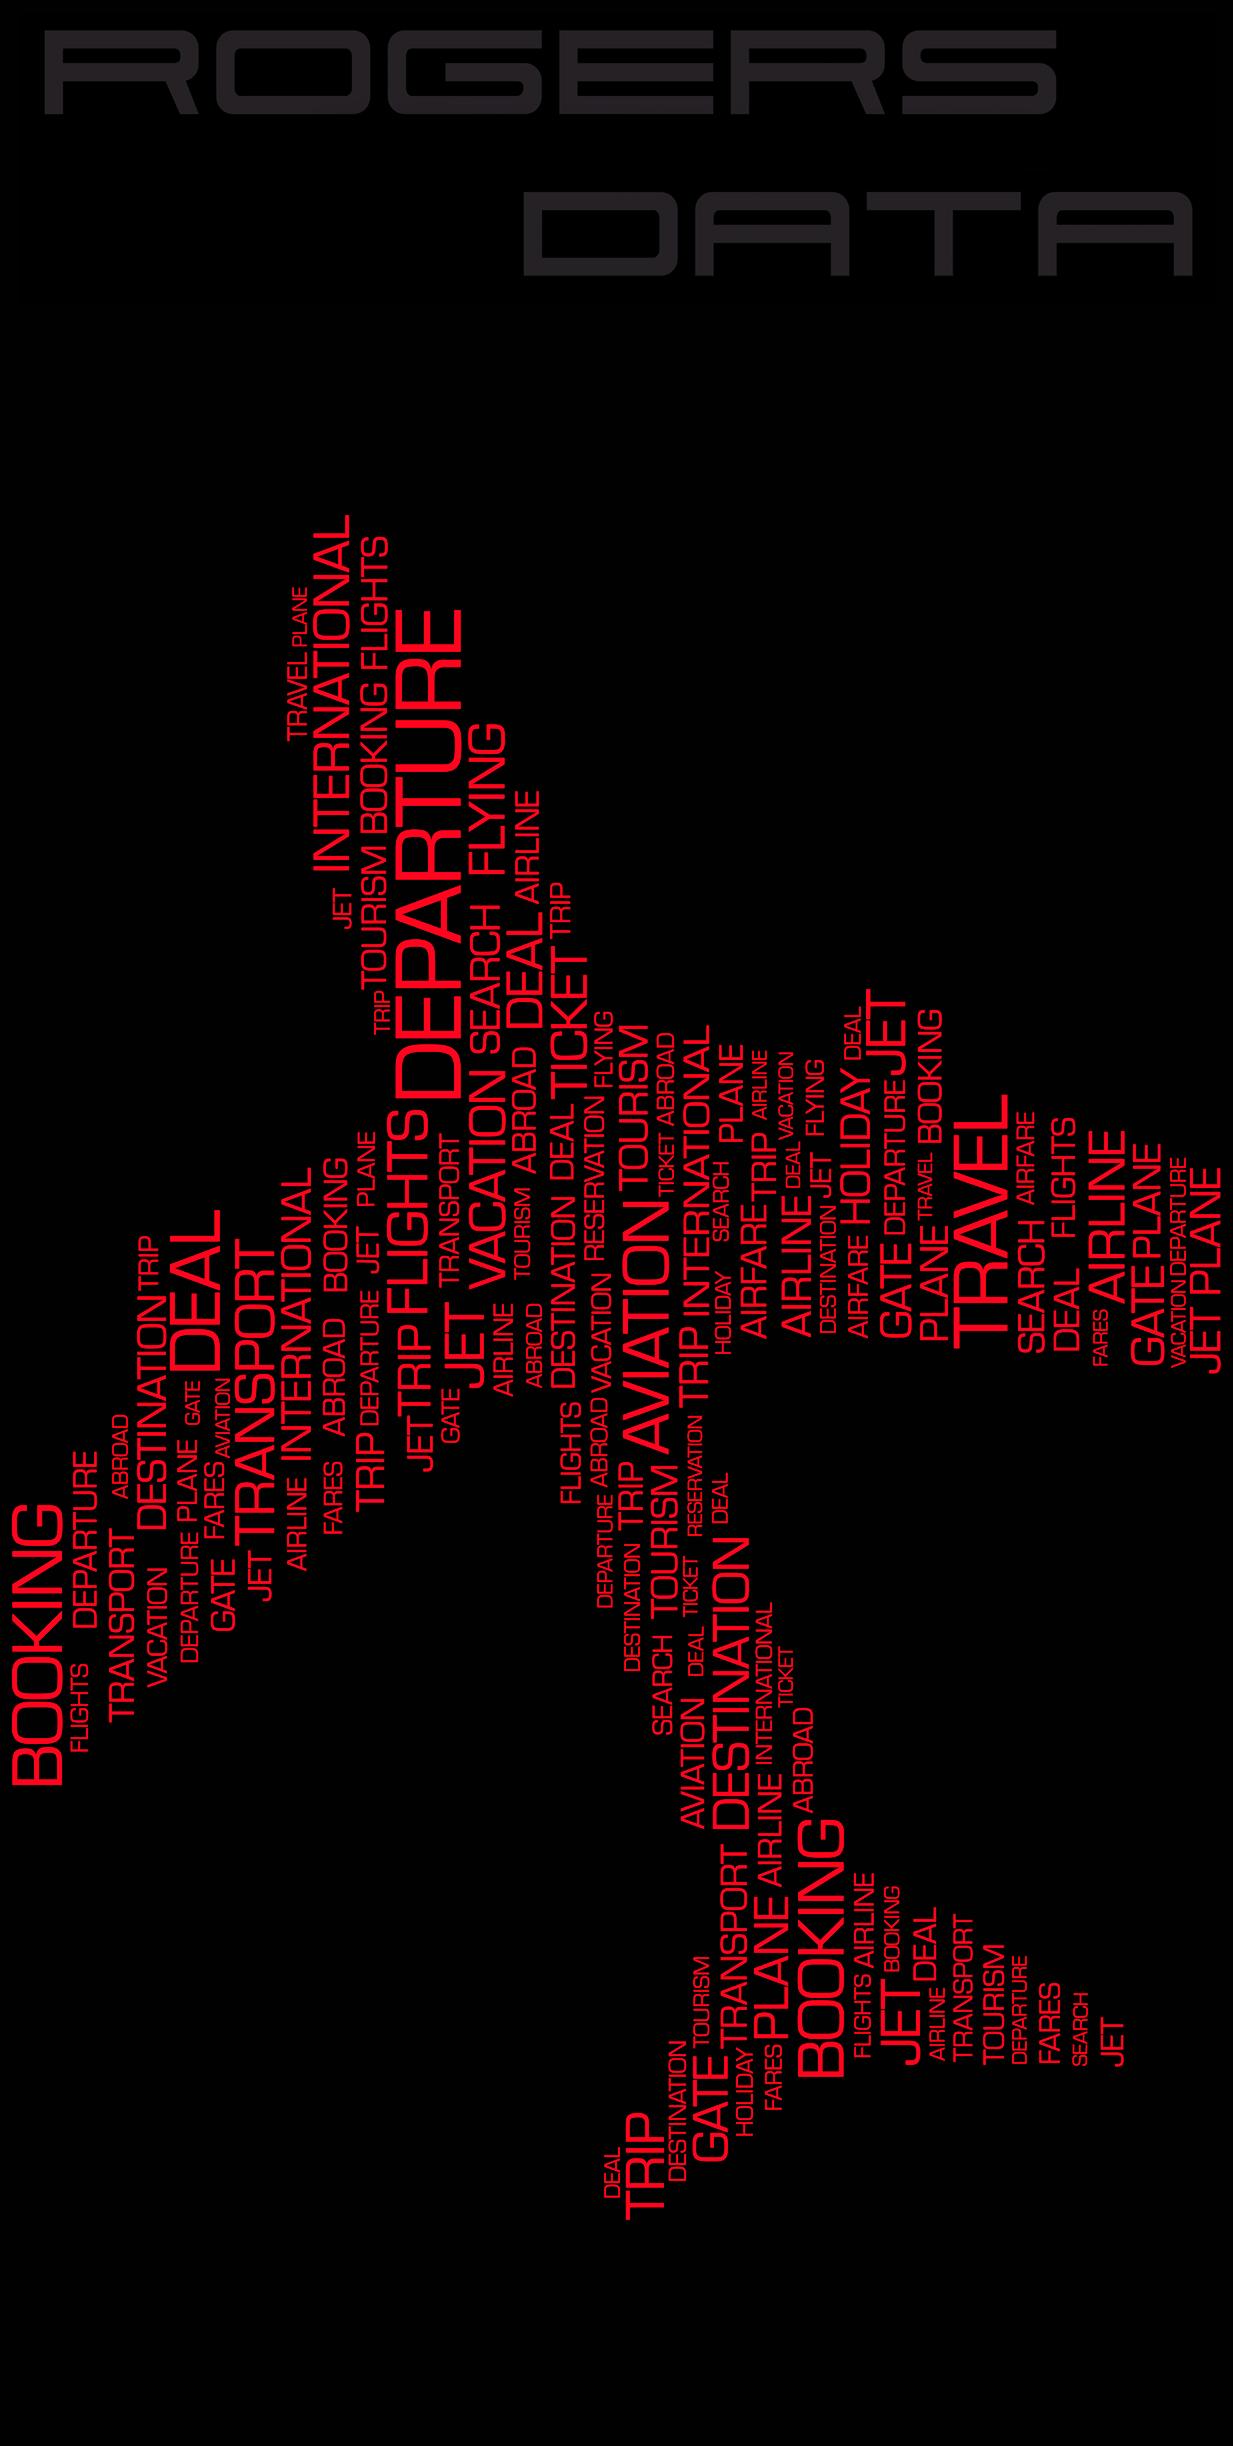 "Rogers Data Badetuch ""Aeroplane"" 90 x 180 cm"